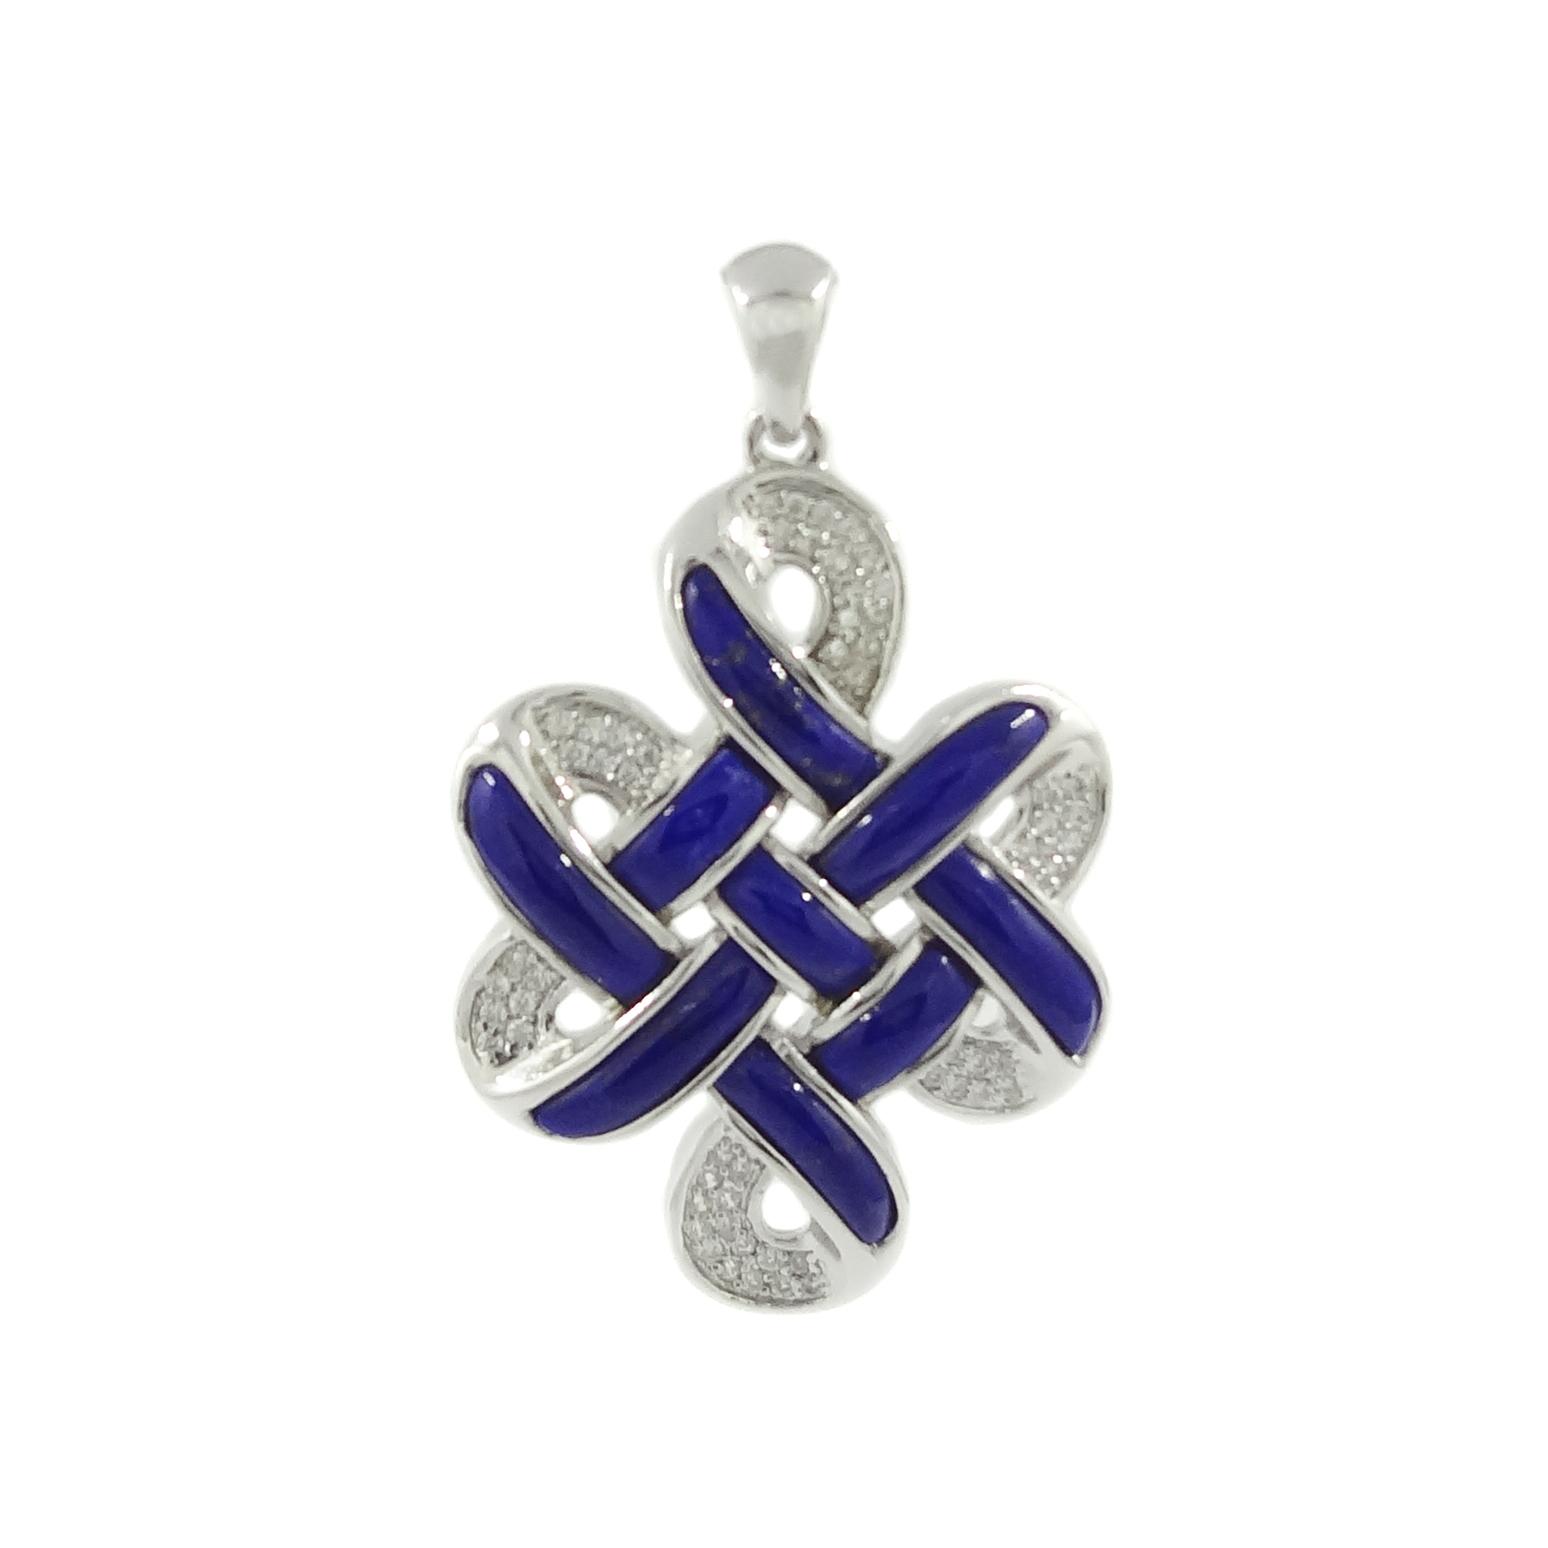 Blue lapis lazulli mystic knot pendant 8treasures blue lapis lazulli mystic knot pendant mozeypictures Image collections